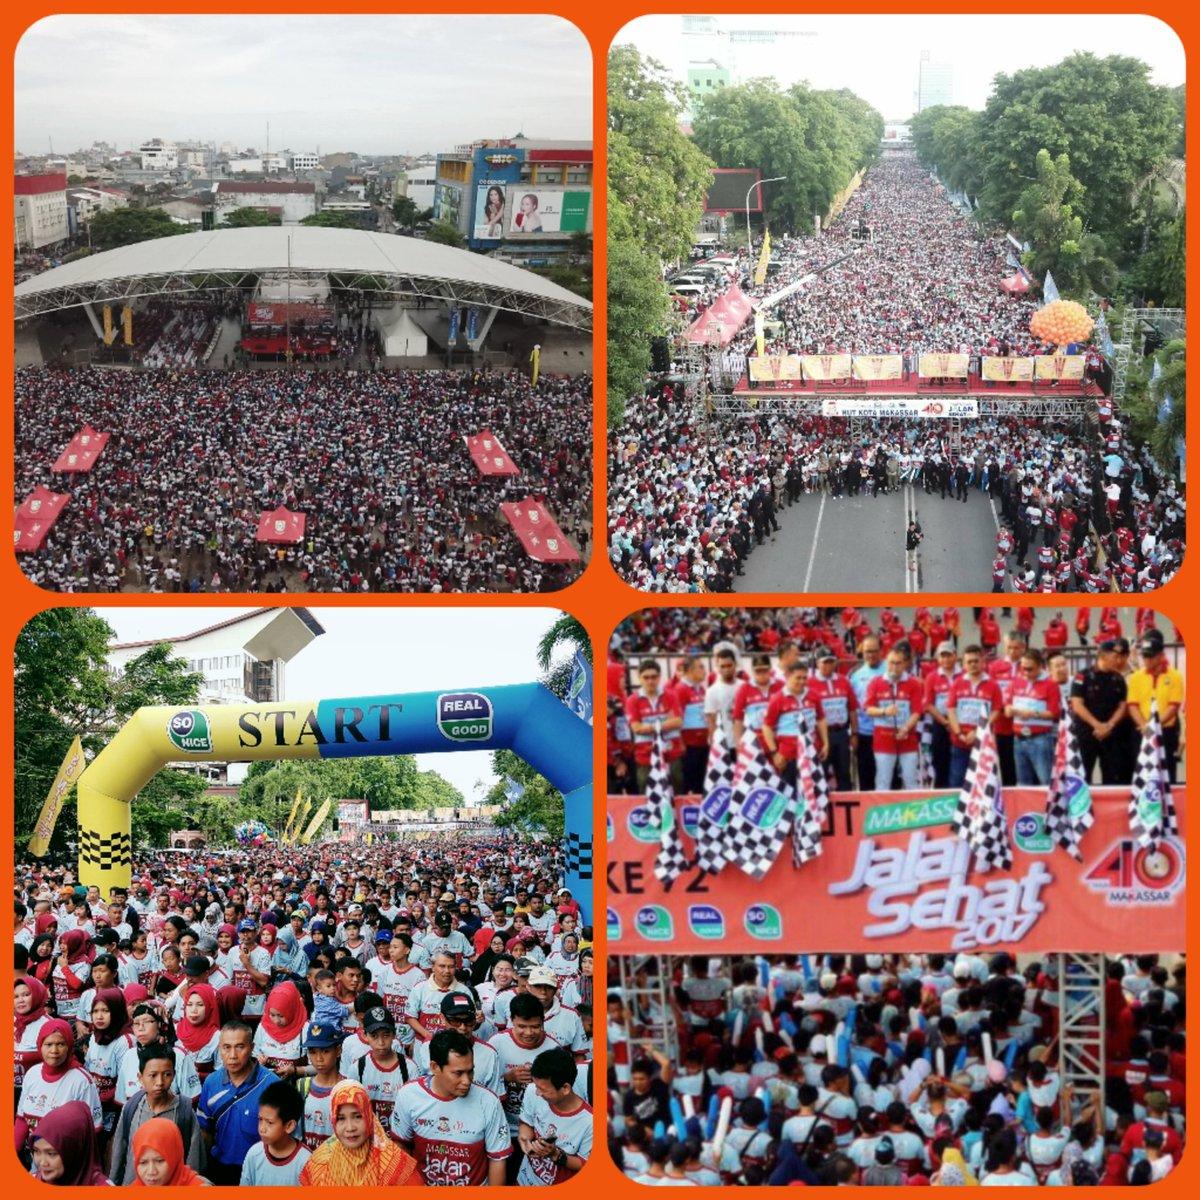 Makassar2✖➕✔ Oppokiiiiii....  Ratusan Ribu Peserta Jalan Sehat HUT Kota Makassar dilepas Wali Kota @DP_dannypomanto  https://t.co/0gvzutPC5u https://t.co/ZZzvfqhxKc